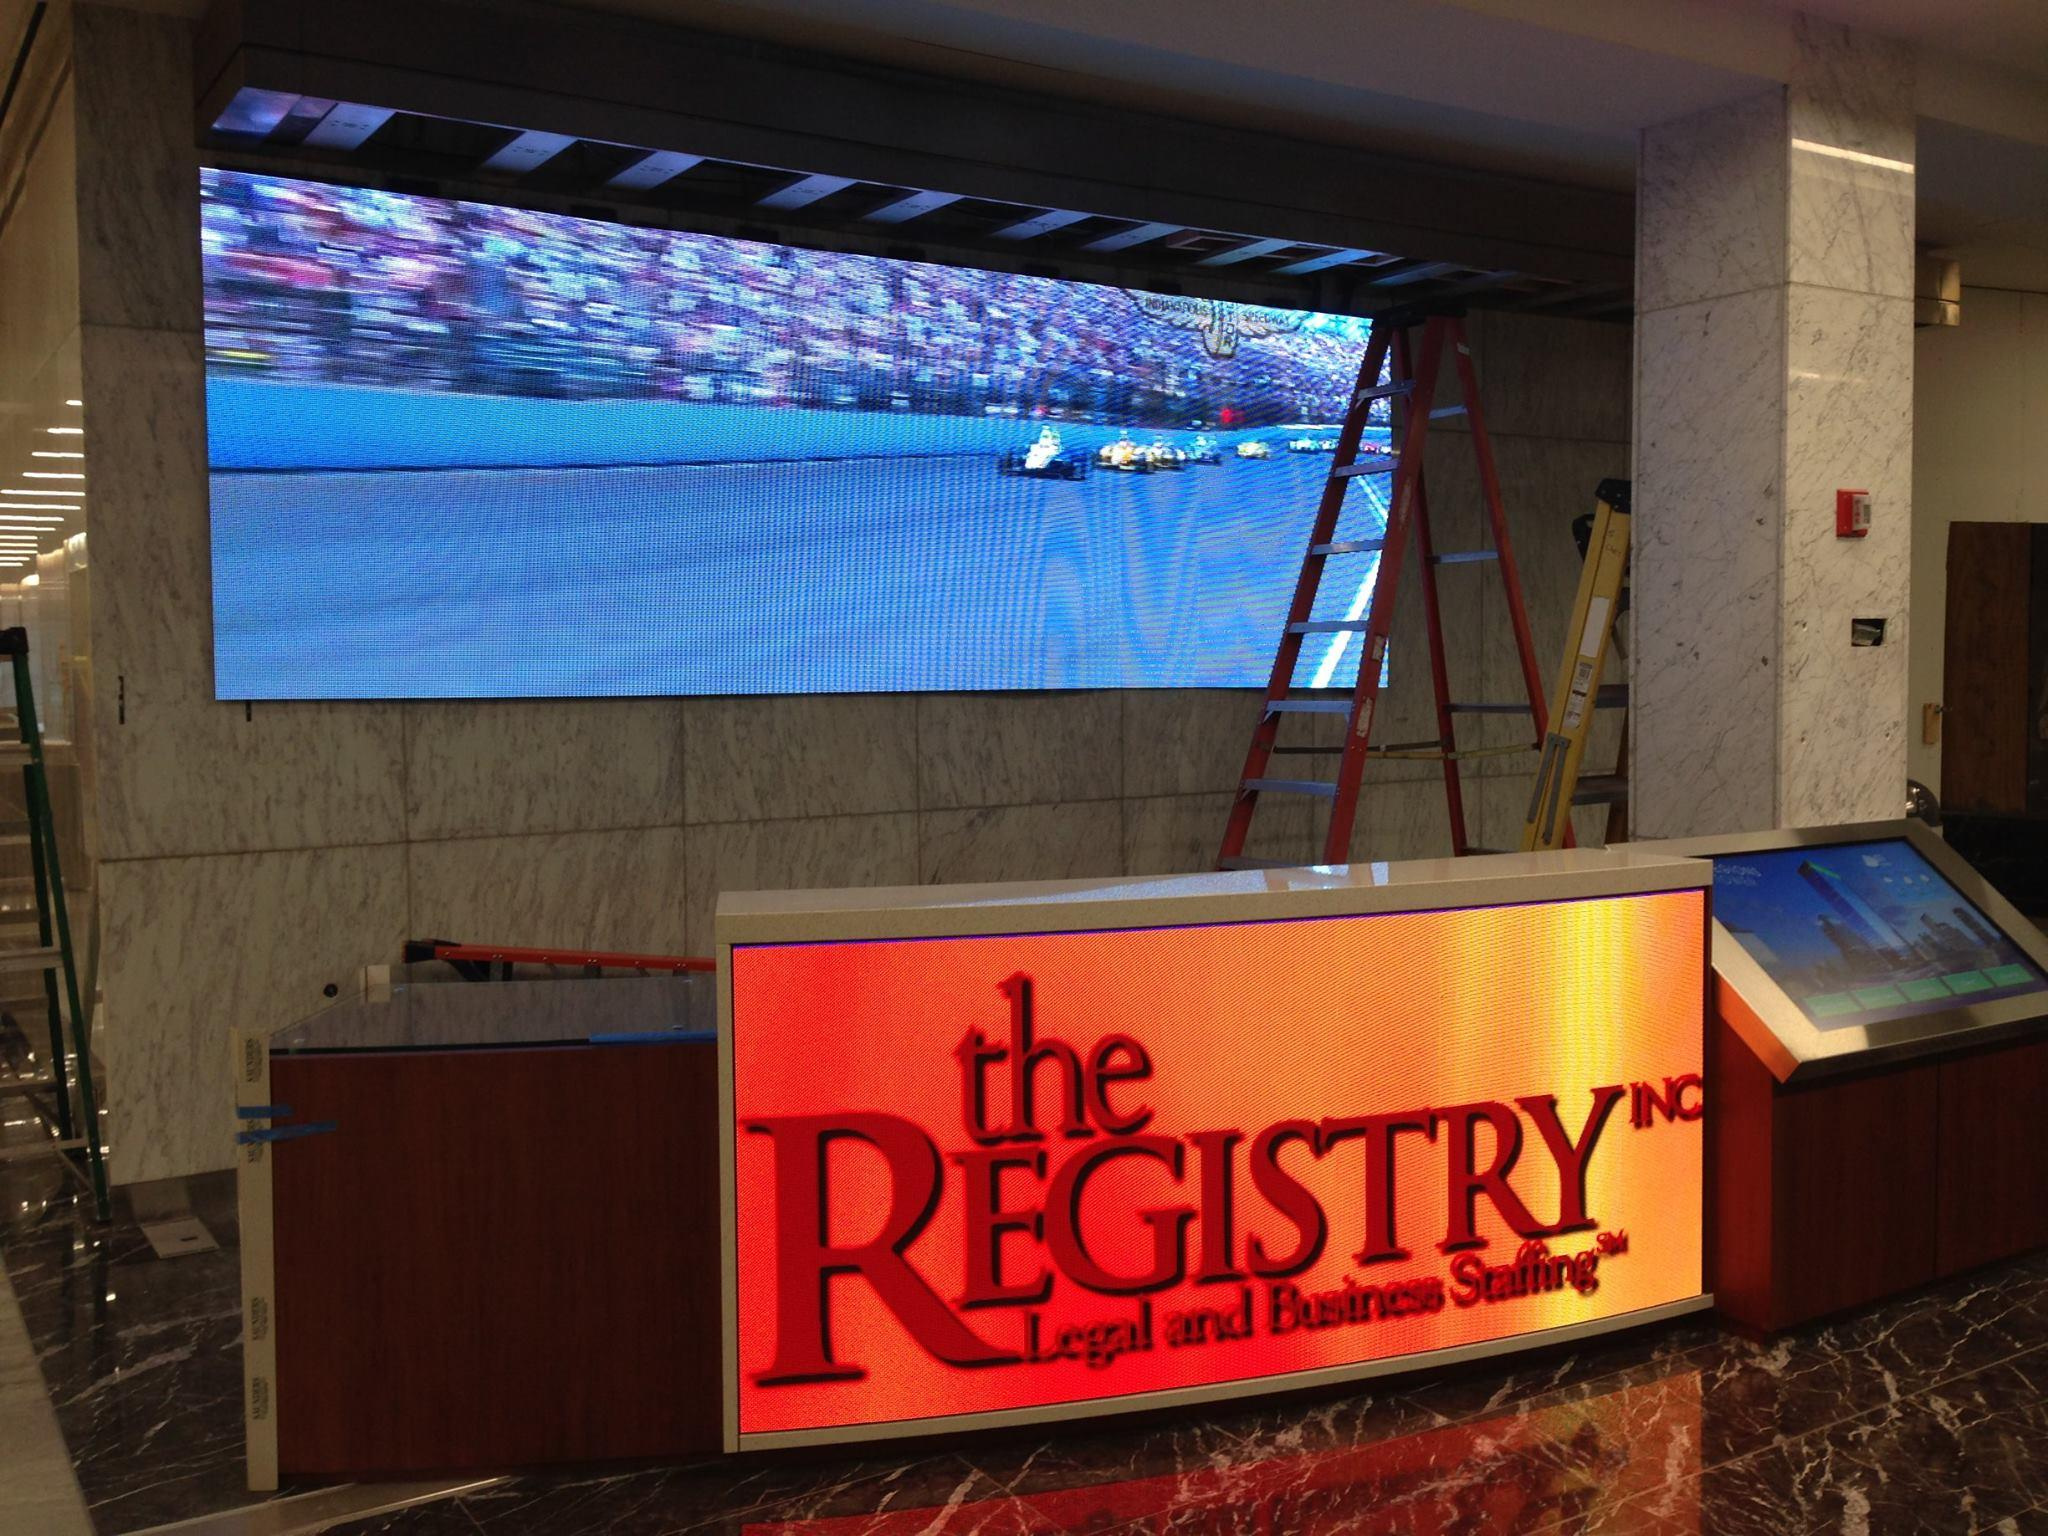 The Registry, Inc. image 3